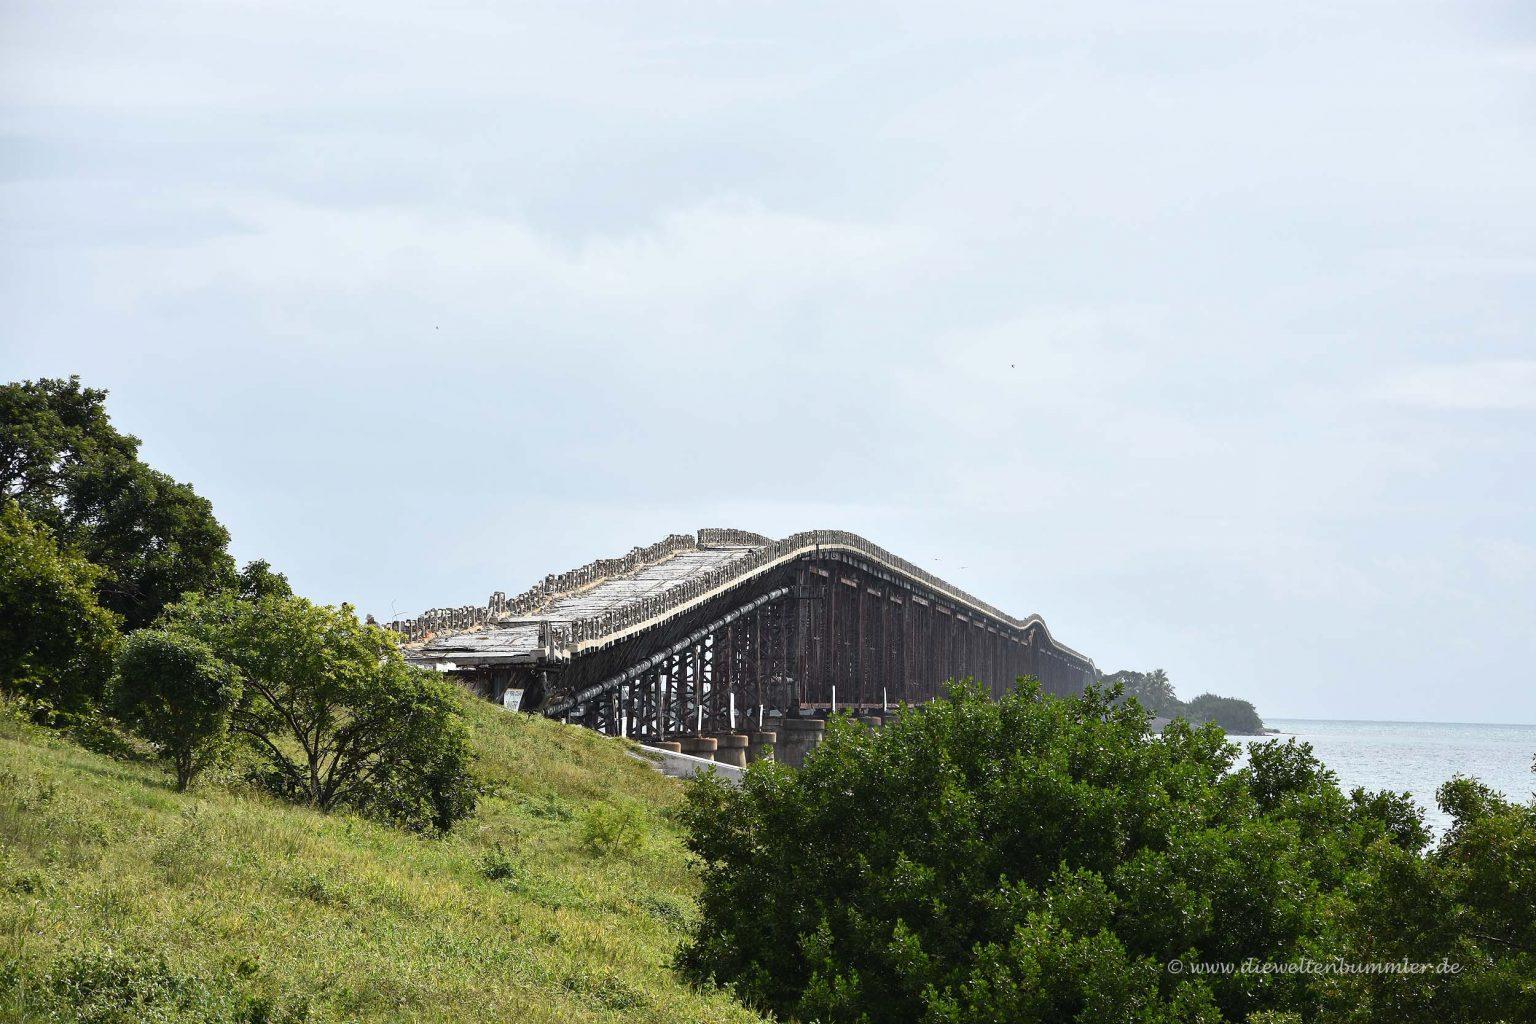 Alte Eisenbahnbrücke auf den Key-Inseln